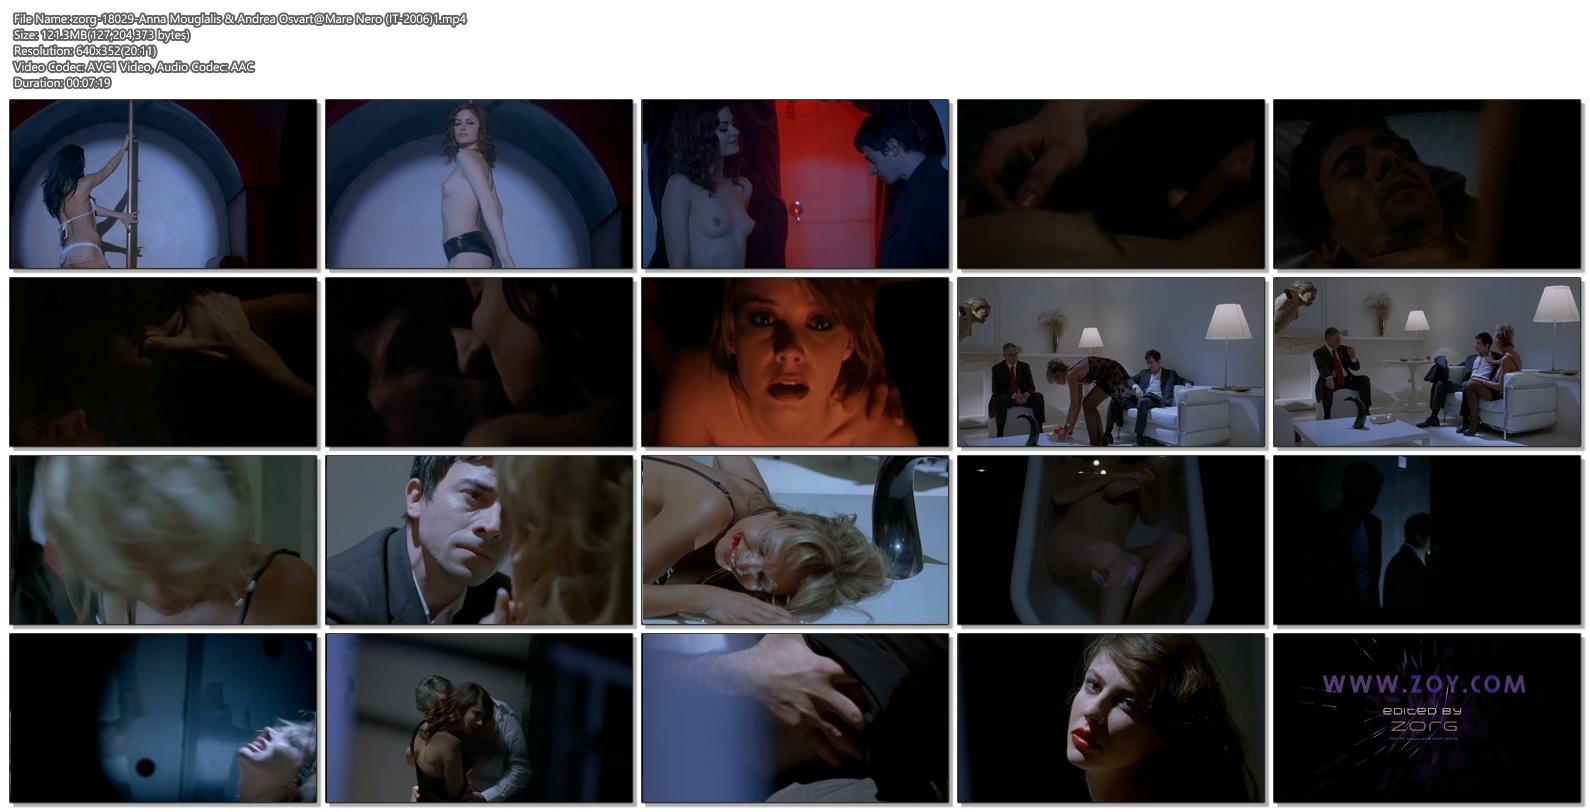 Andrea Osvárt Nuda anna mouglalis nude andrea osvart nude sex and others all